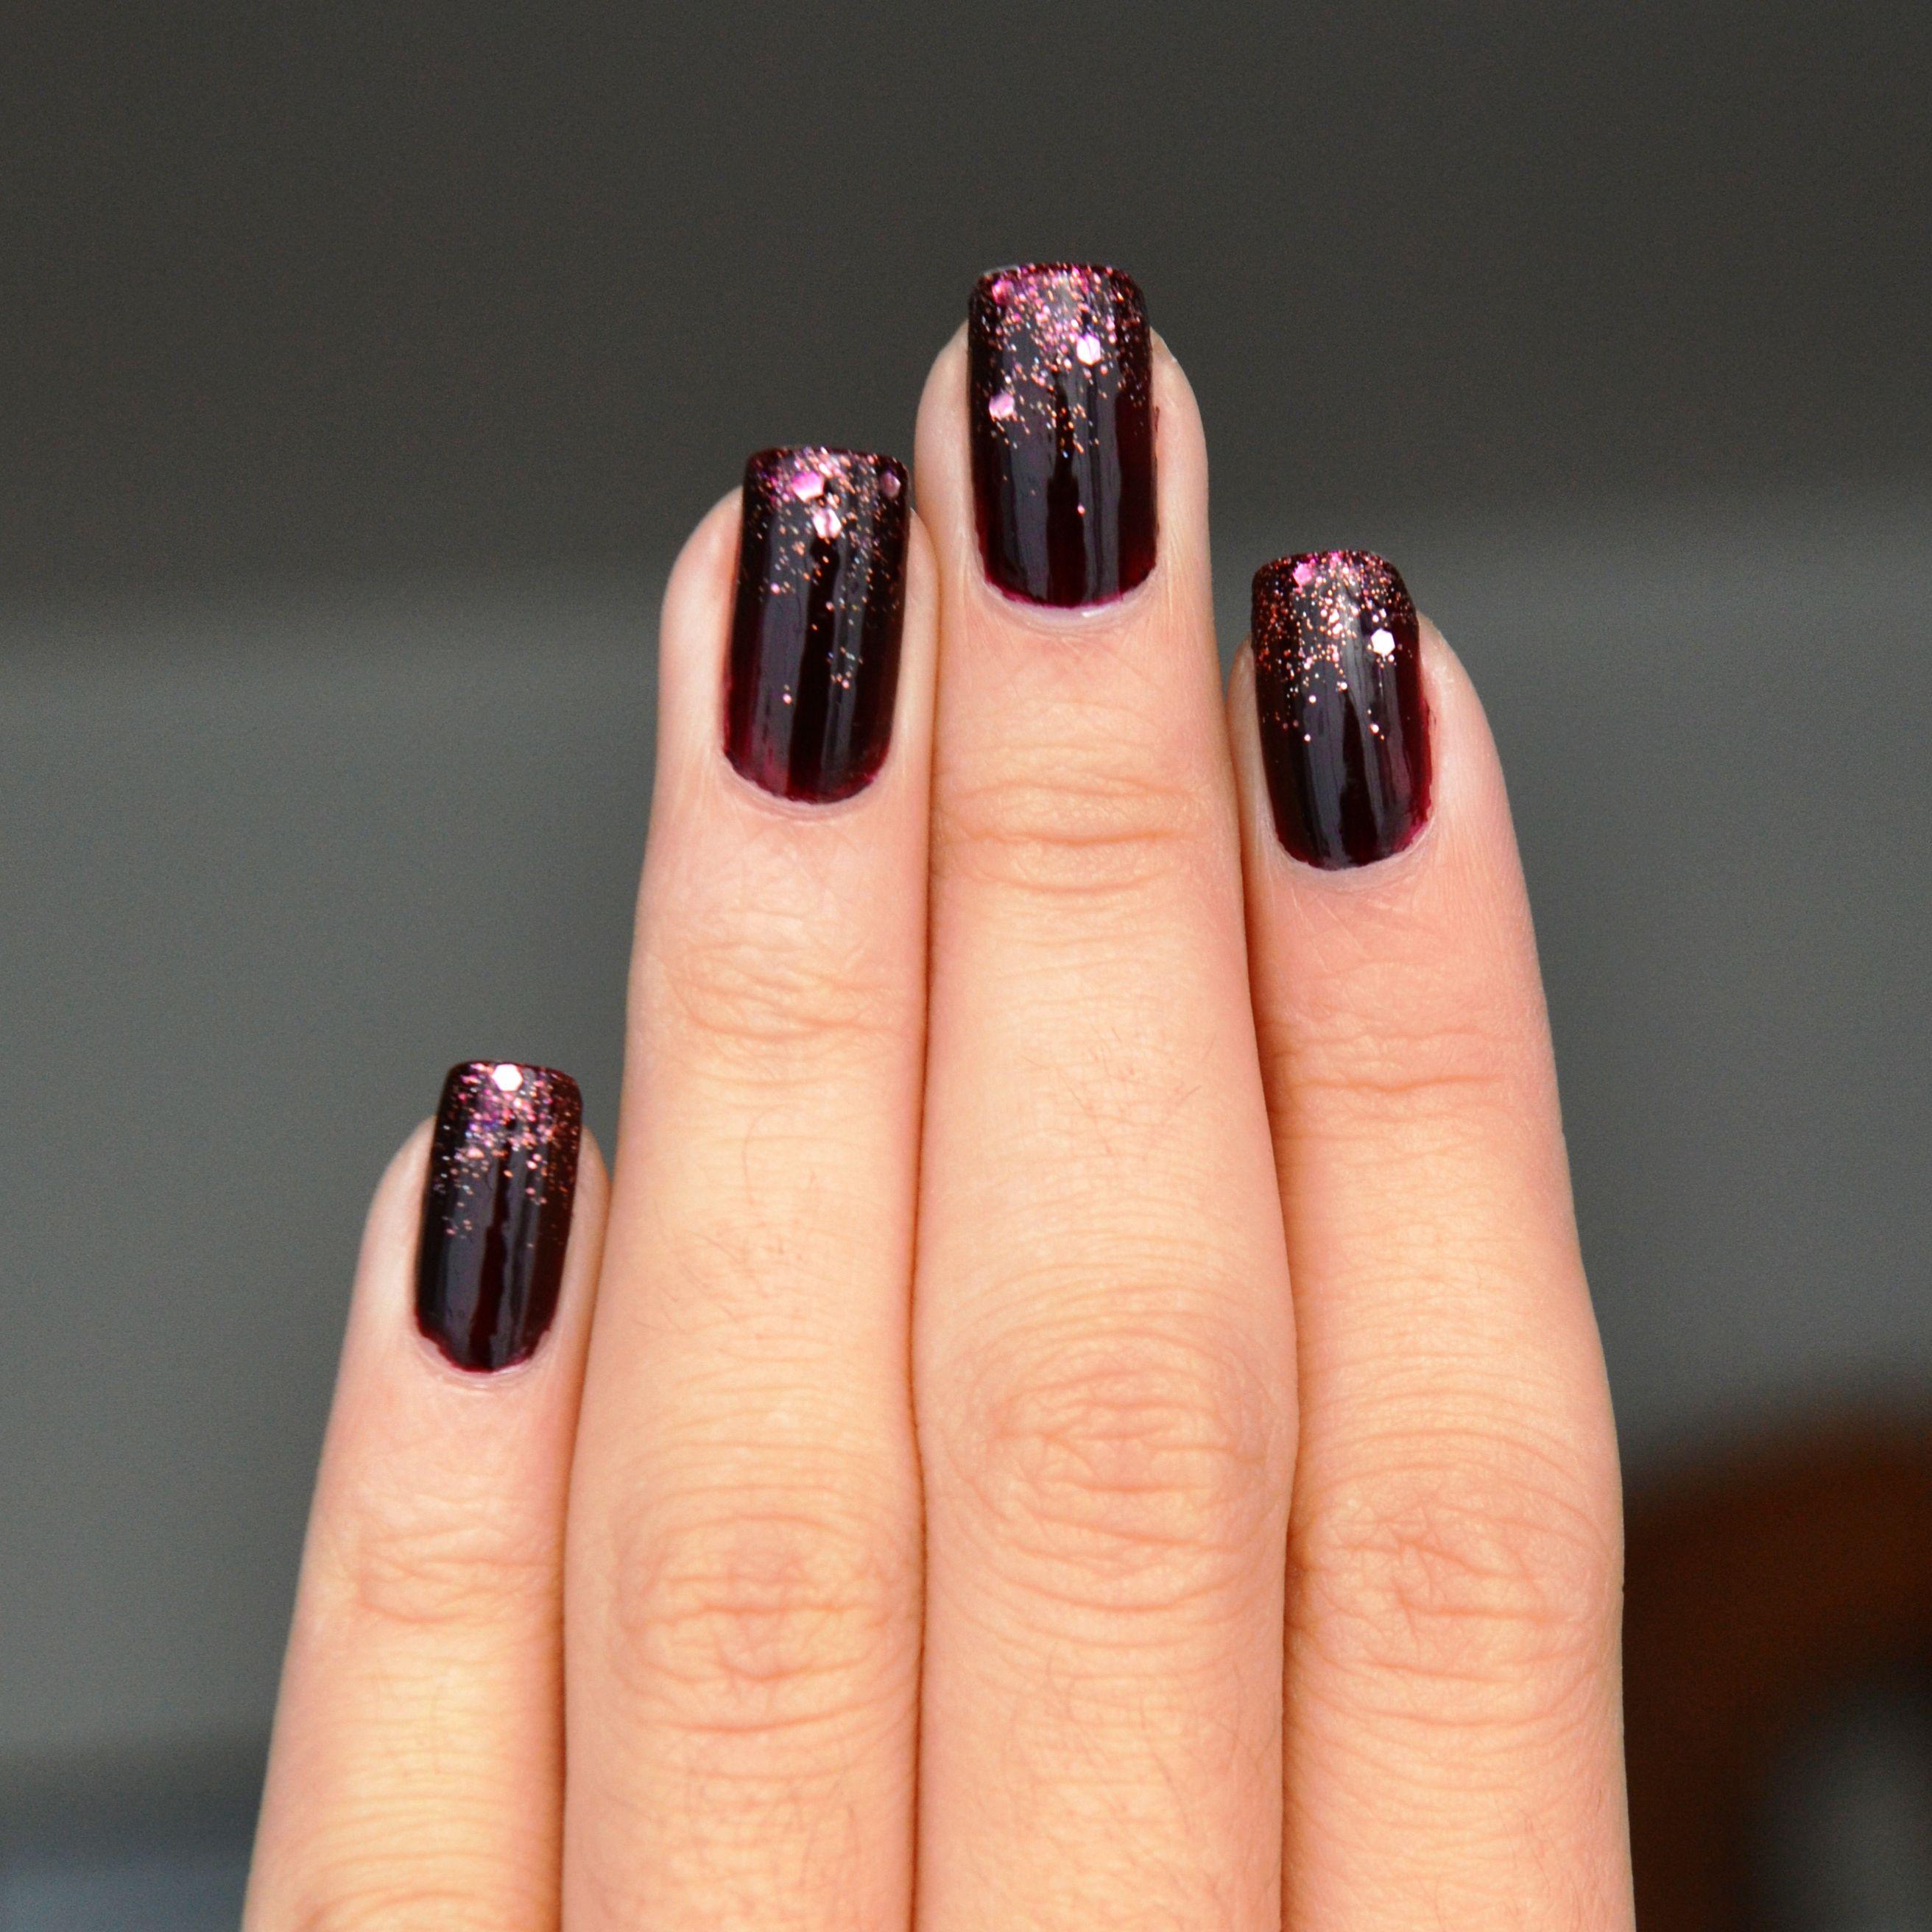 oxblood nail polish rose gold glitter